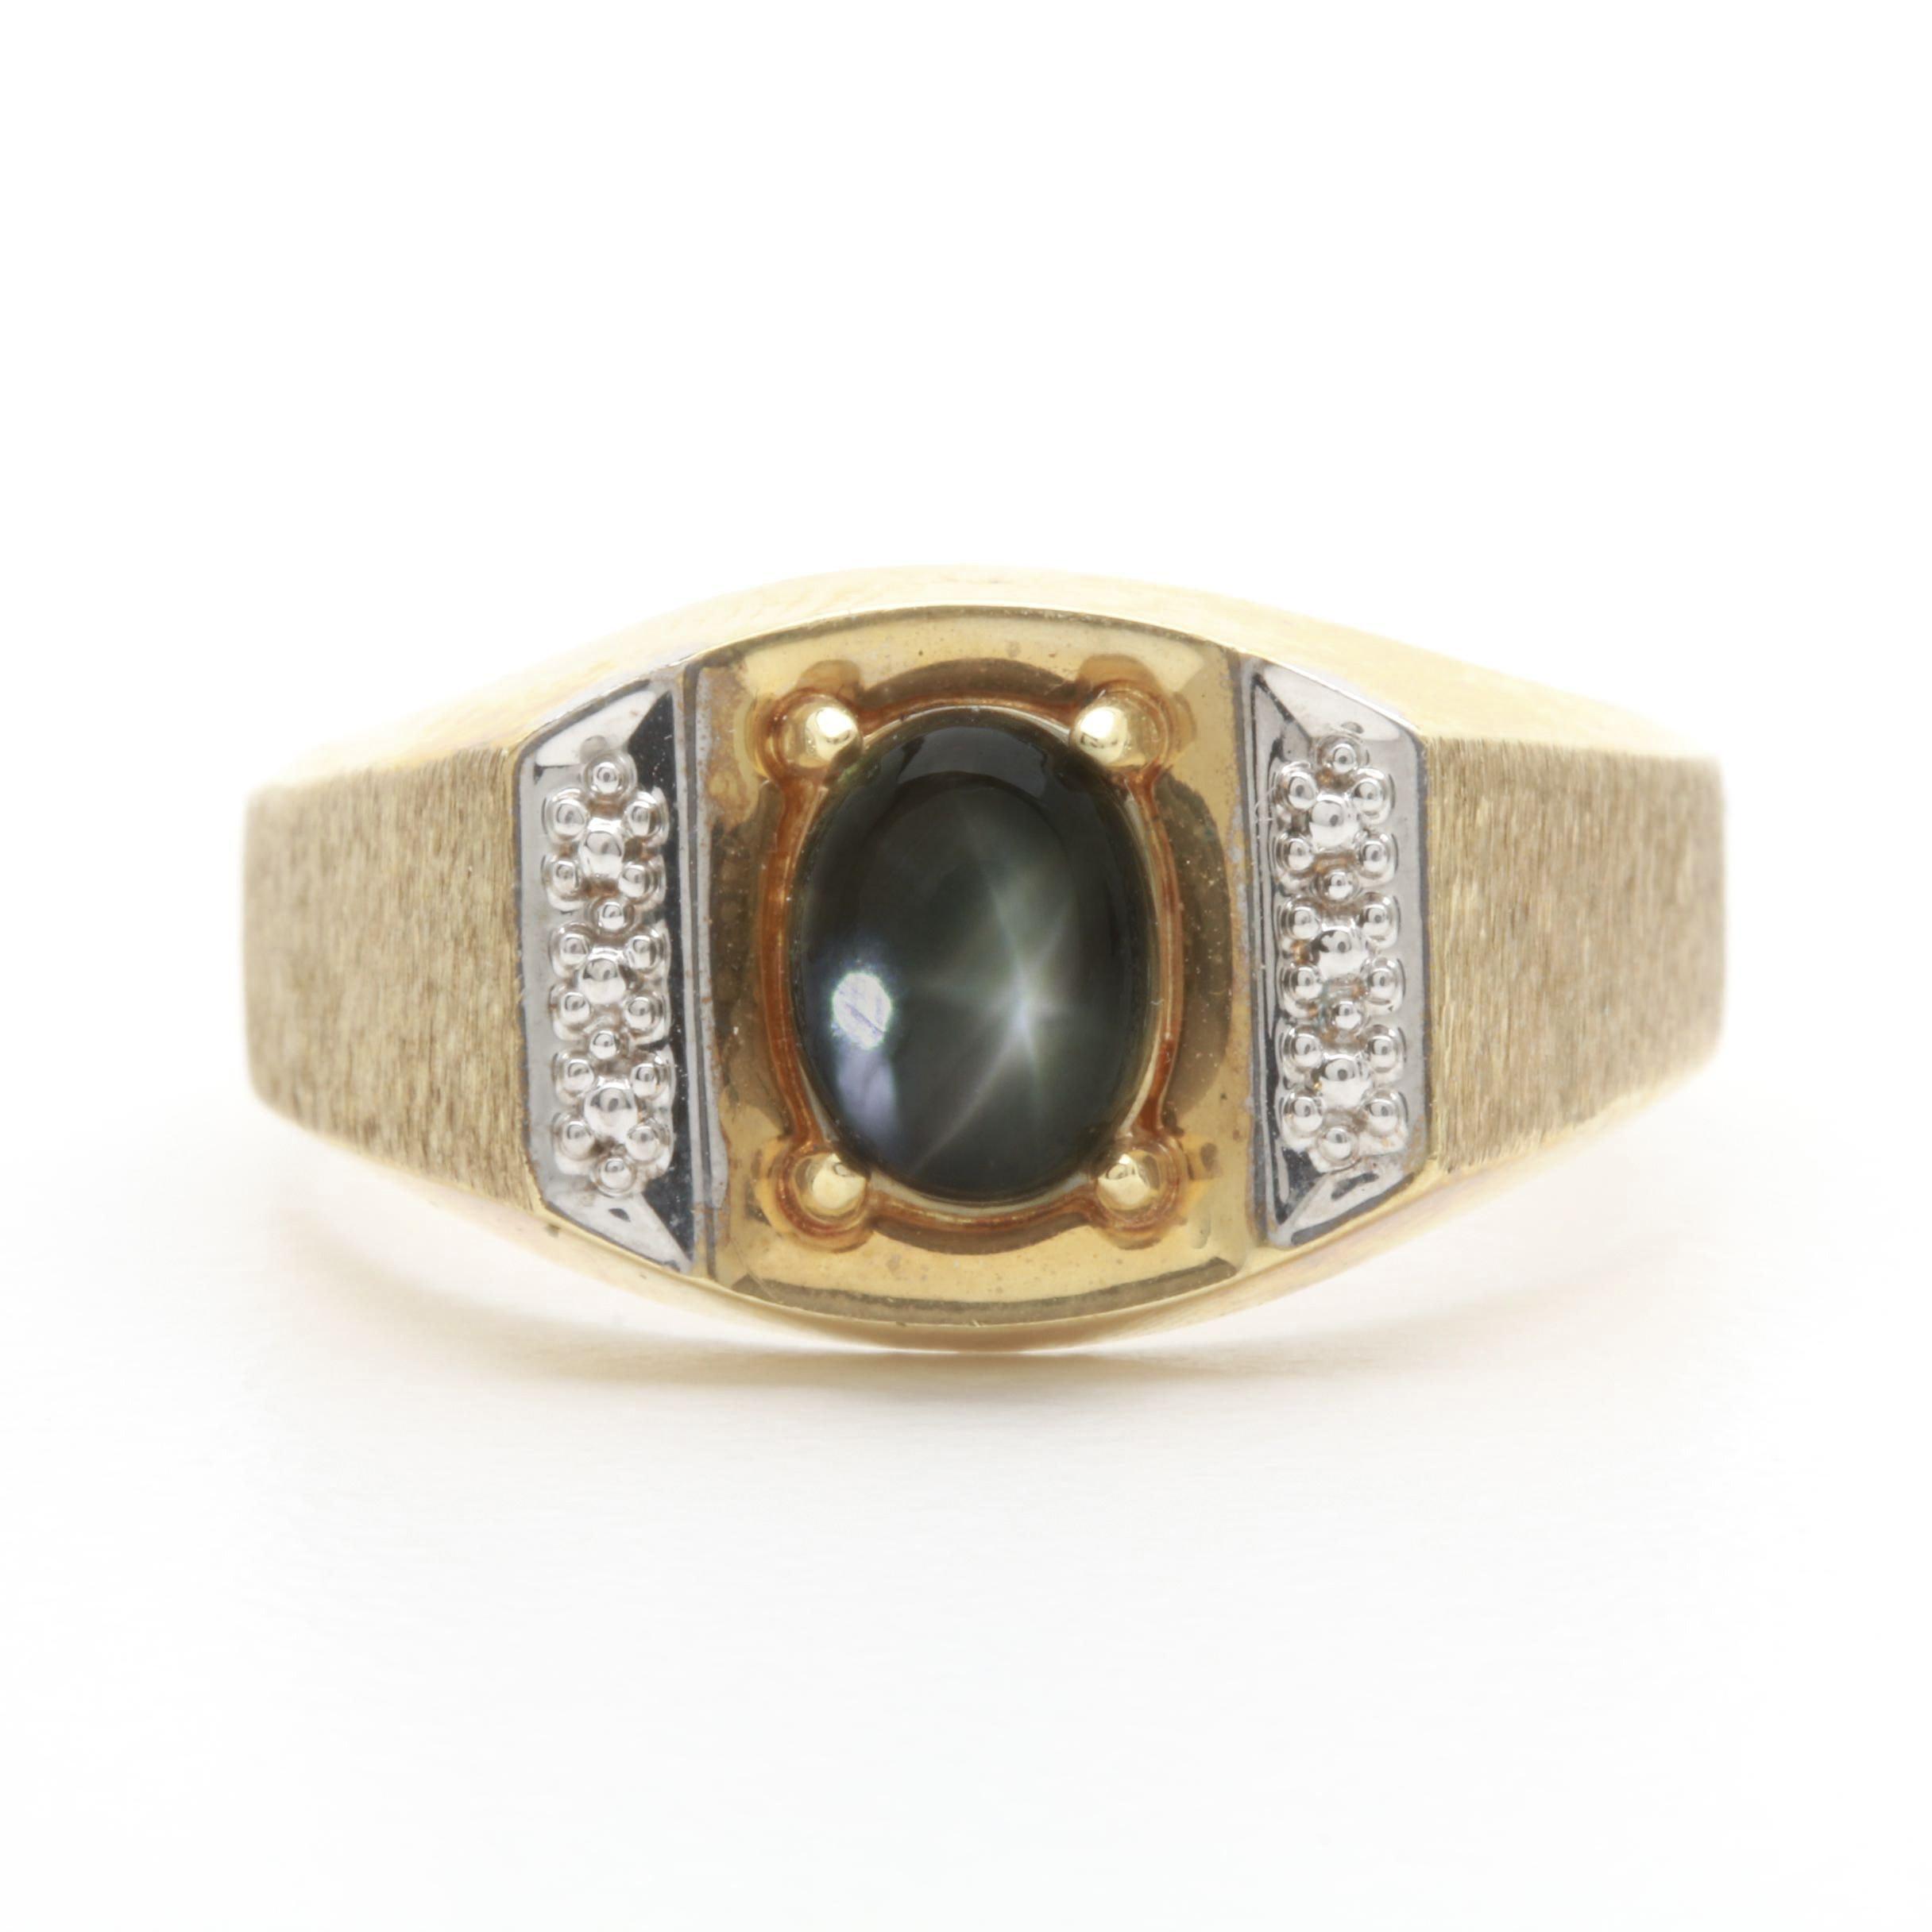 10K Yellow Gold Black Star Sapphire Ring